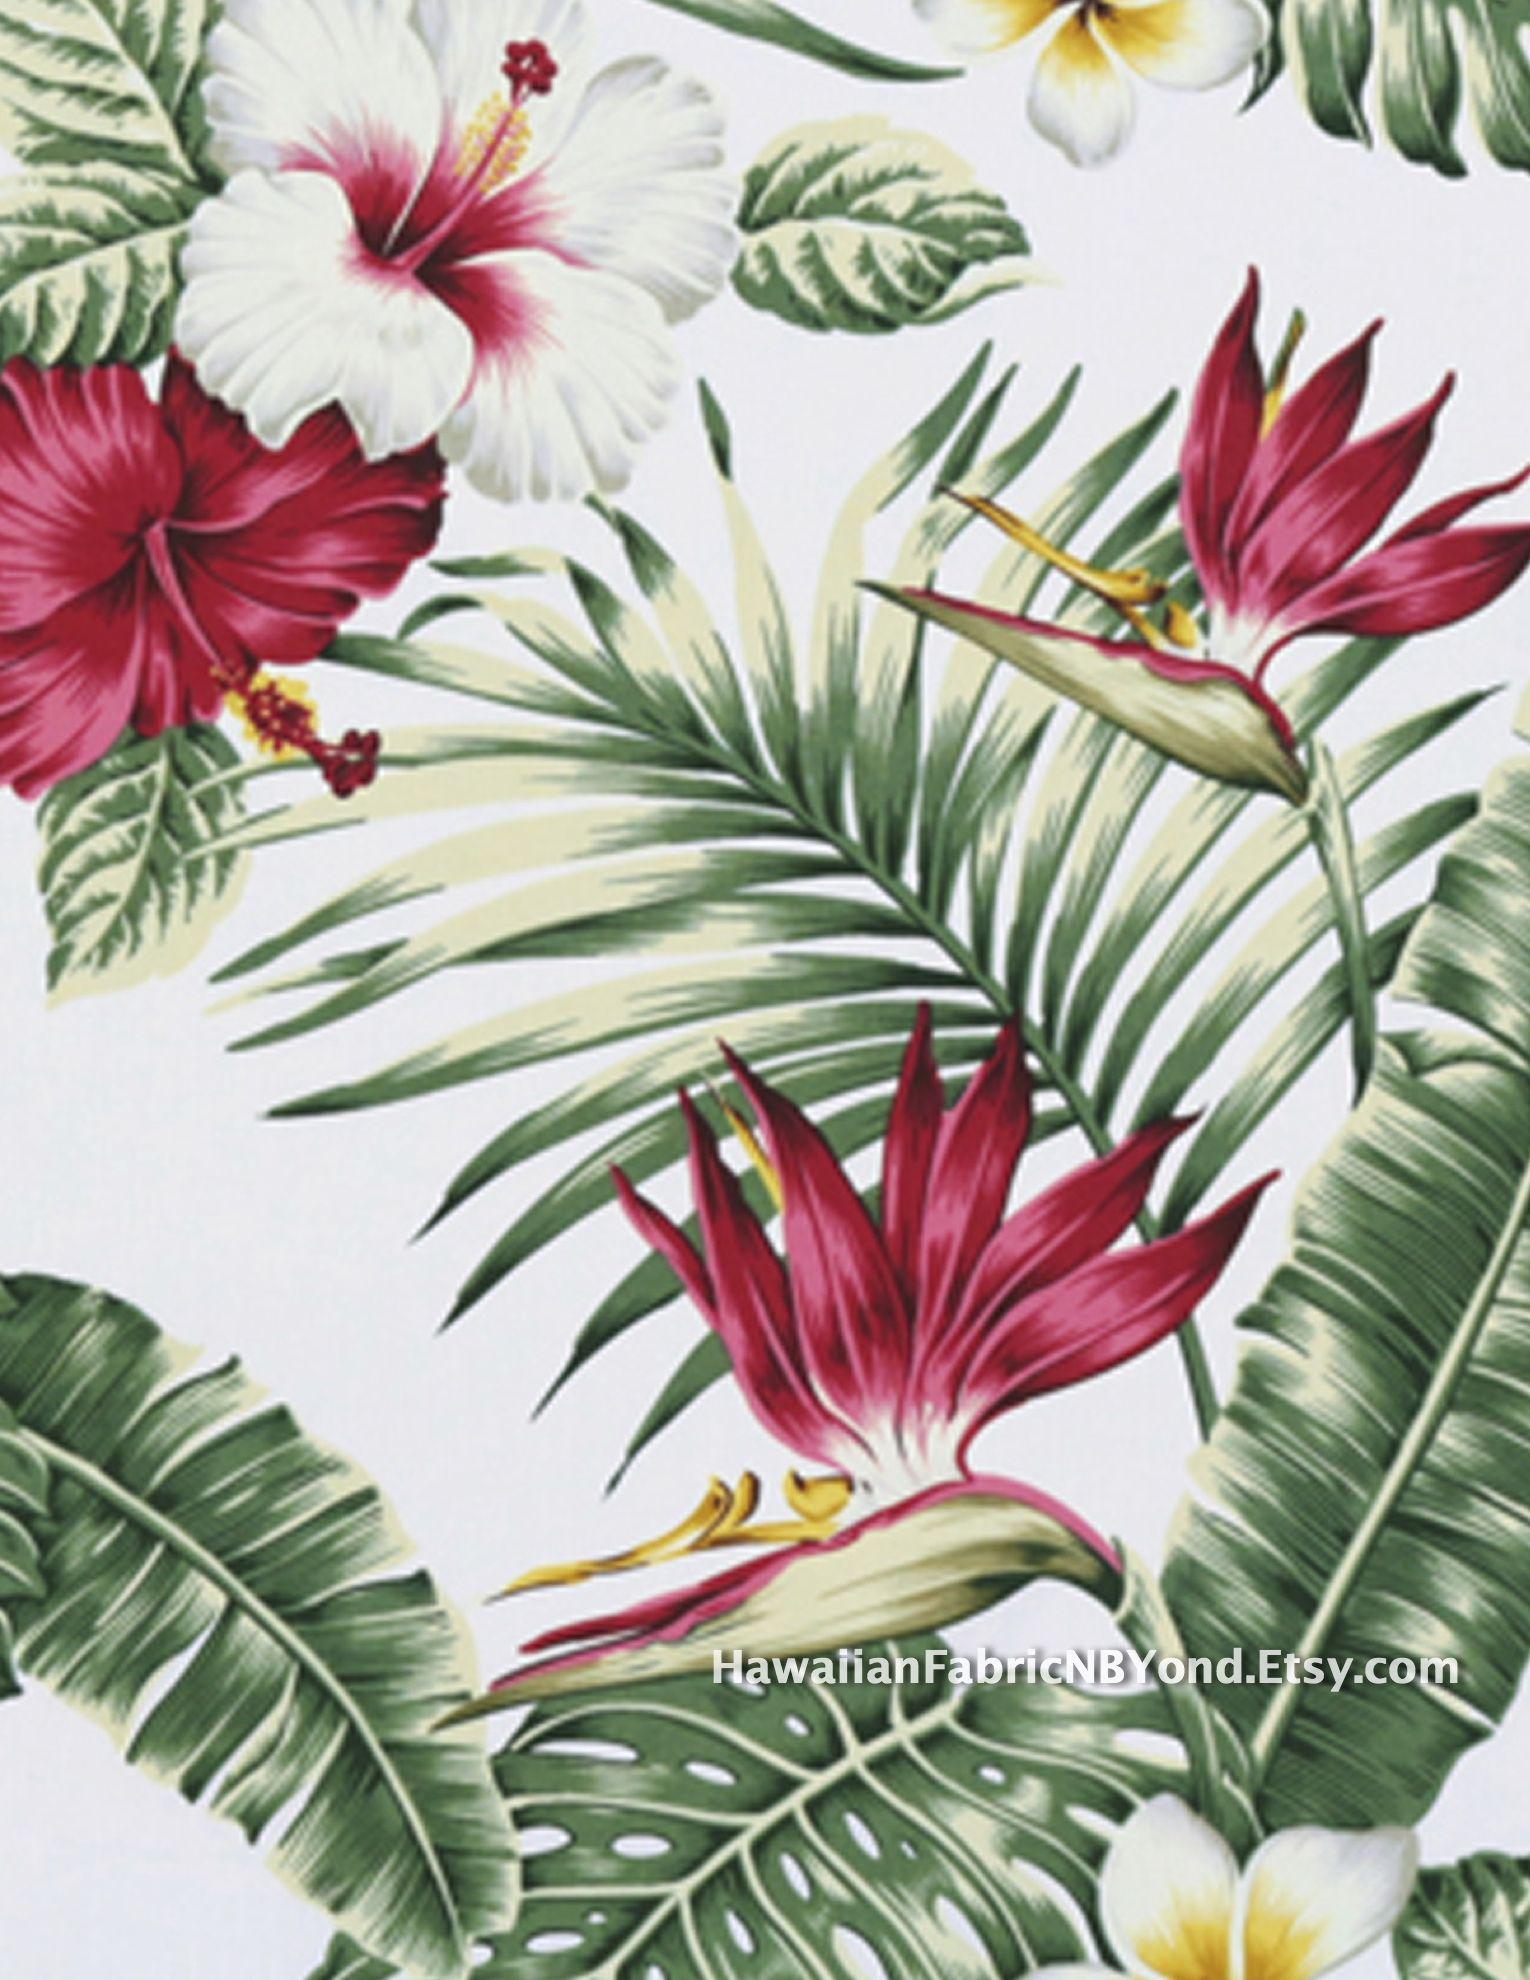 Tropical Fl Fabric Beautiful Hawaiian Print Cotton Sold By The Yard At Hawaiianfabricnbyond Etsy